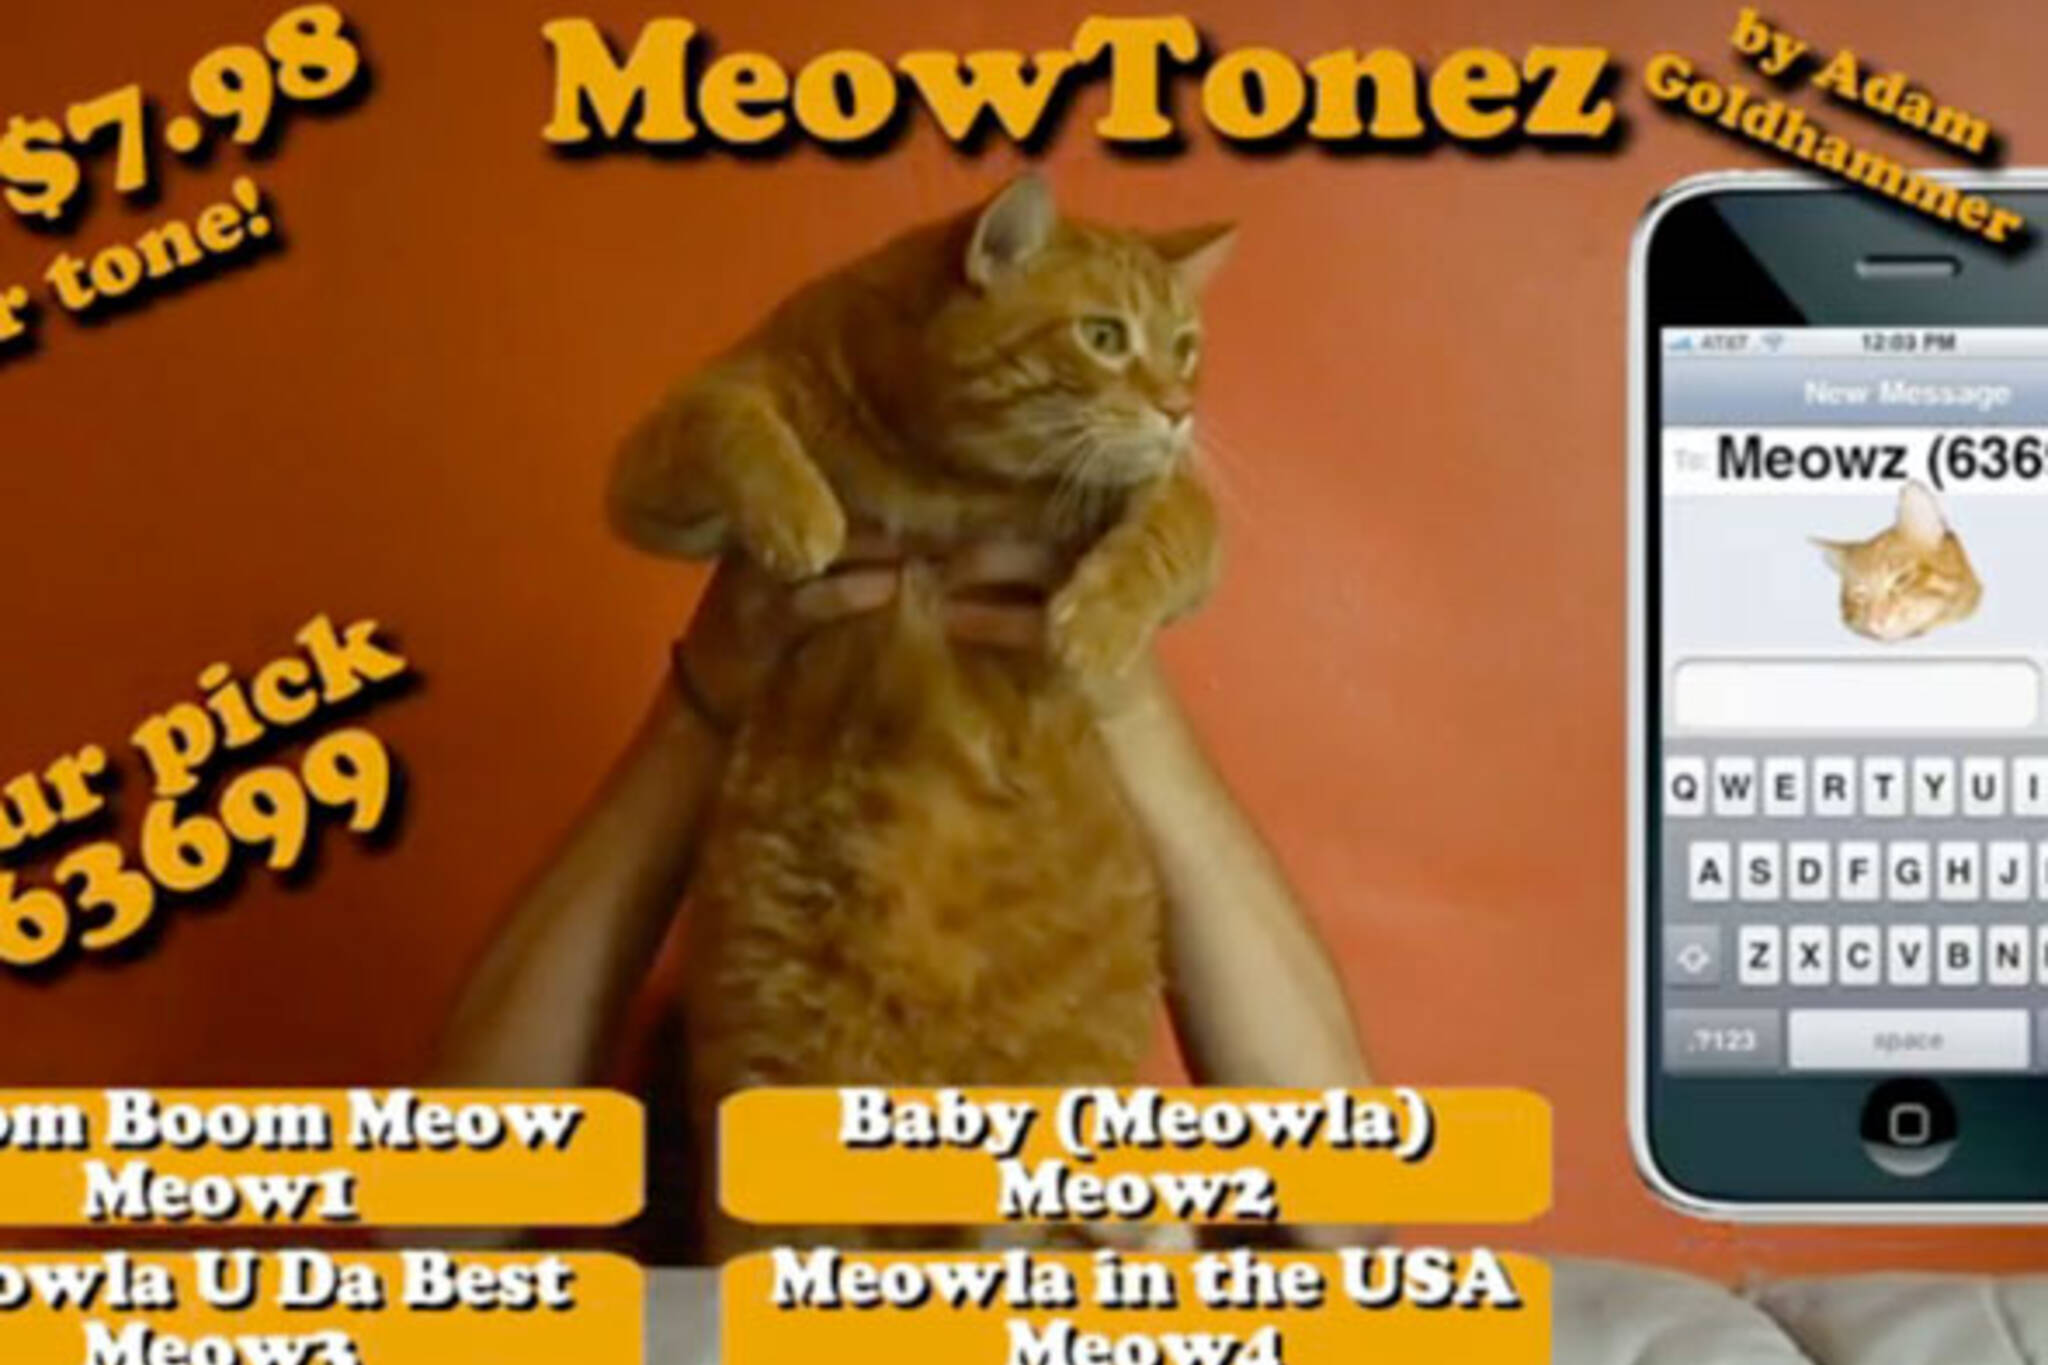 Meowla